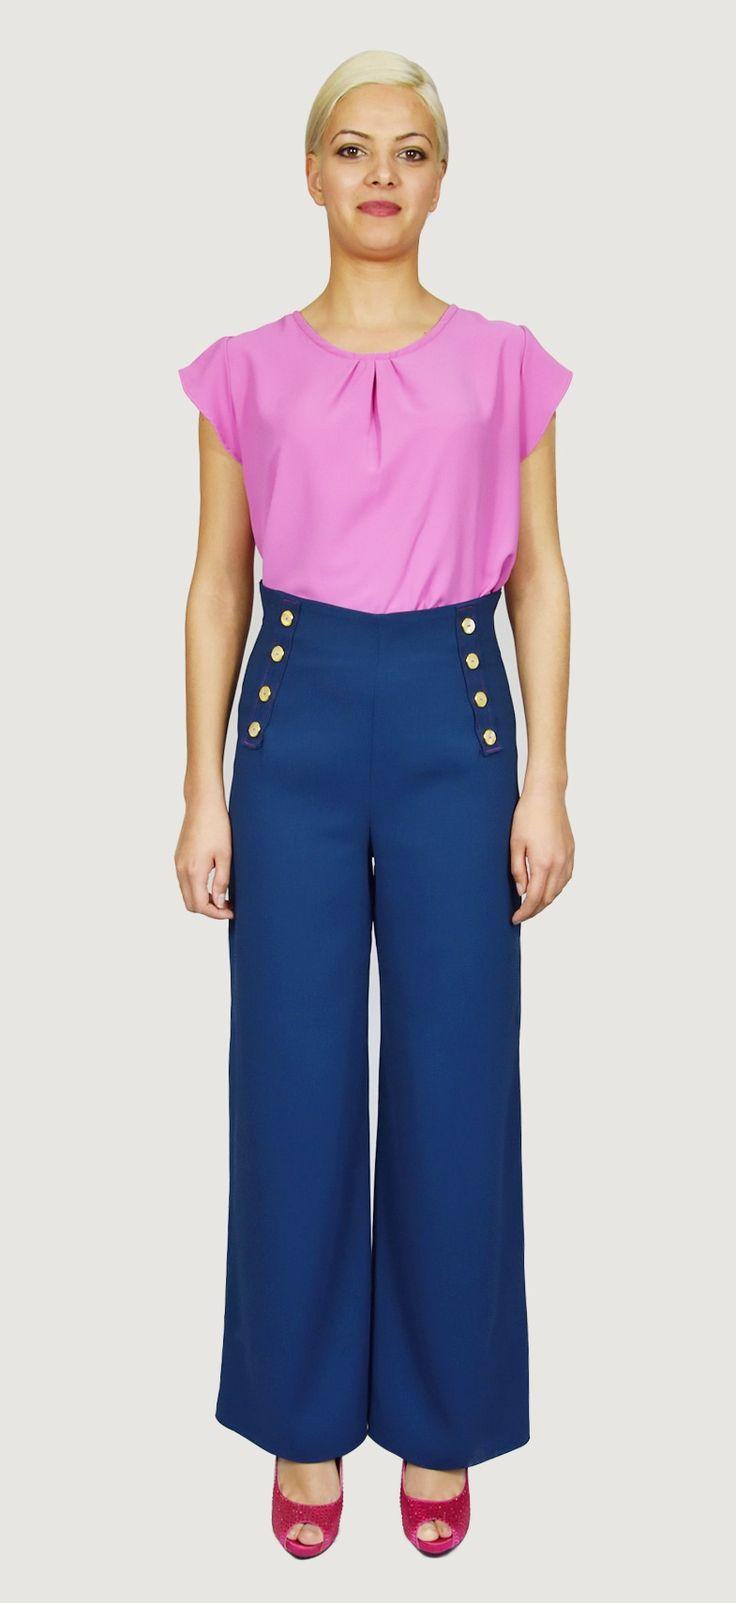 Pantalón Azúl en algodón, alto de cintura con doble abotonadura de adorno,cremallera en parte trasera, muy ancho de pierna. Detalle de los pespuntes en fucsia.